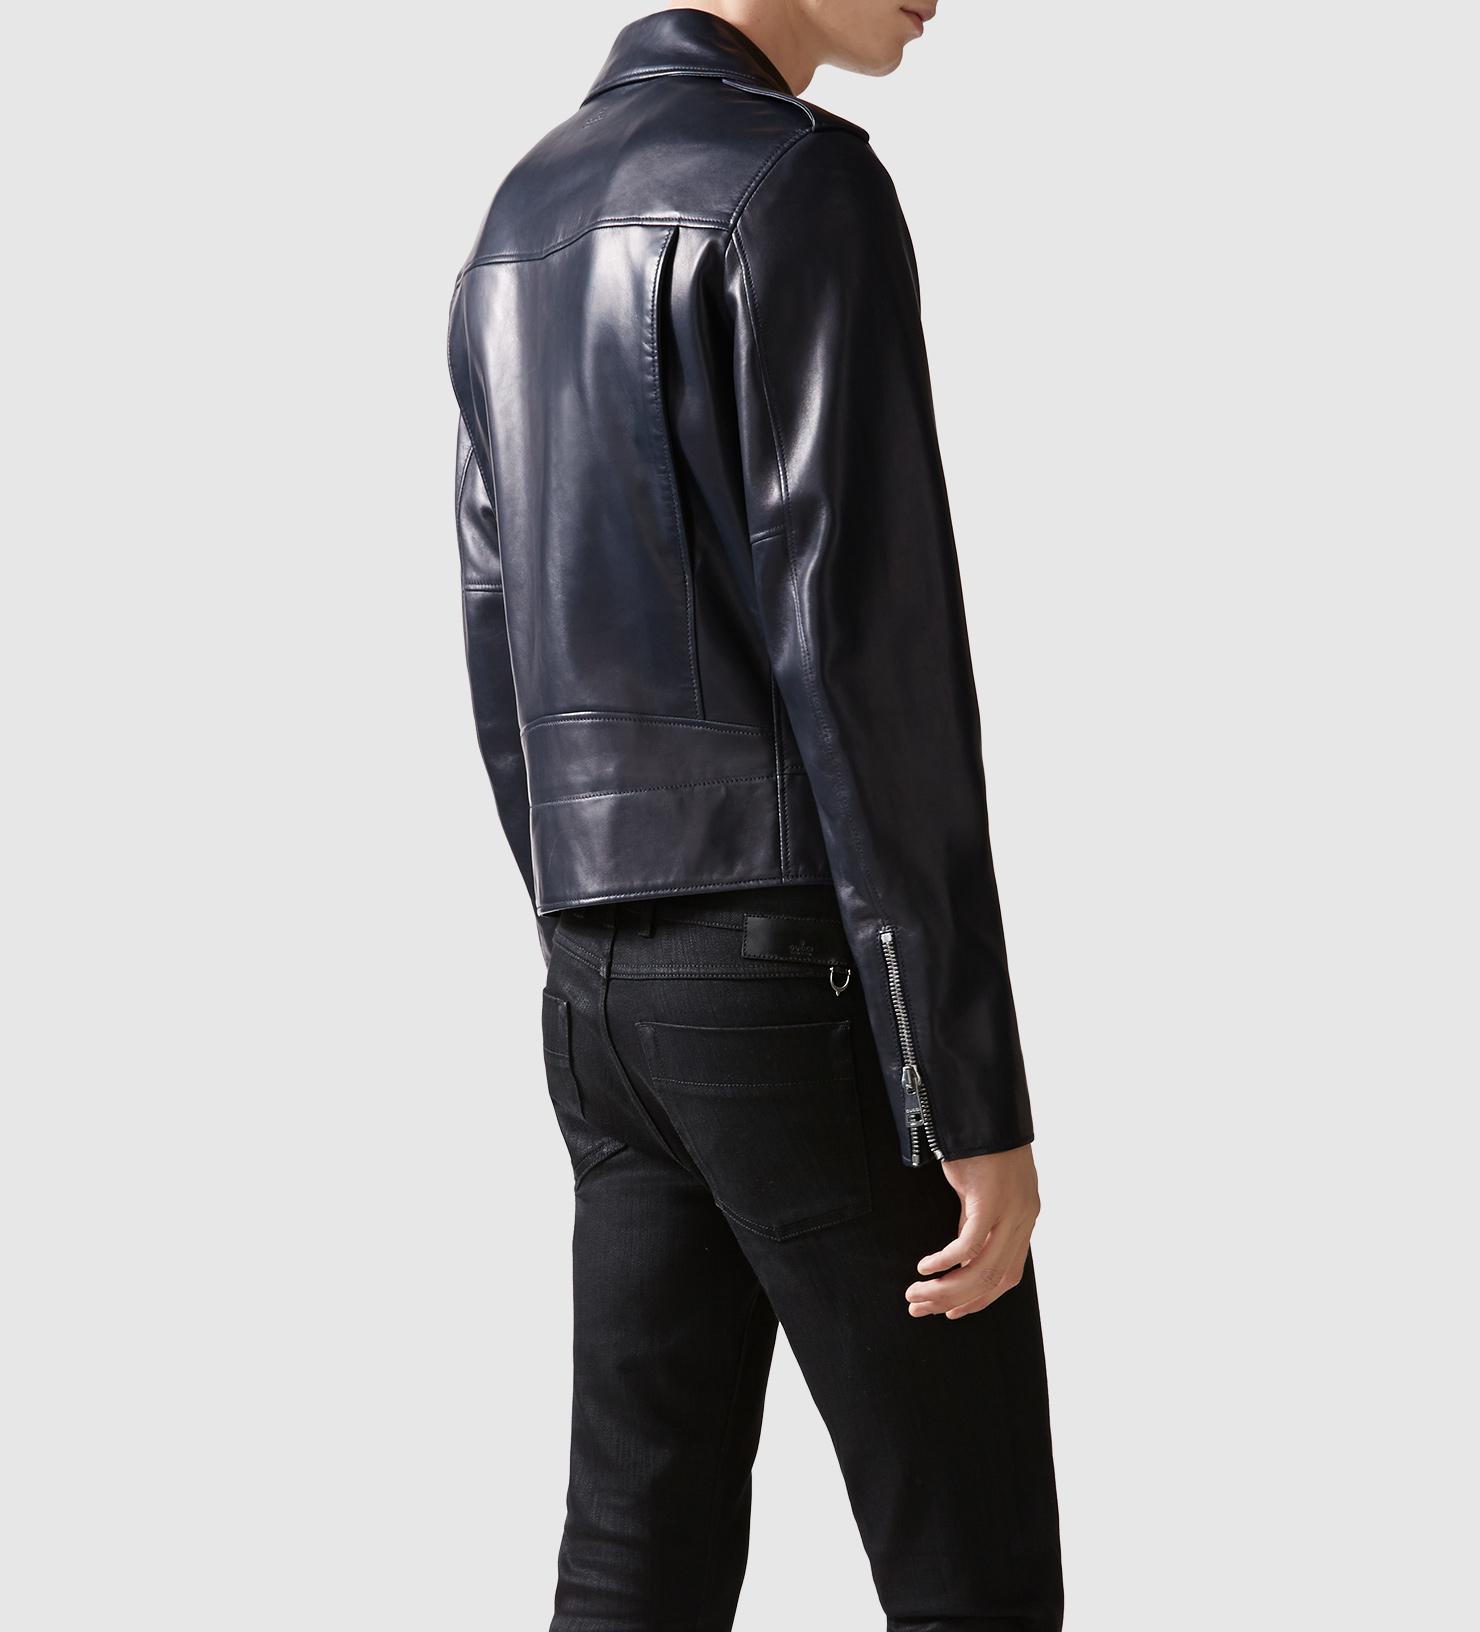 lyst gucci leather biker jacket in black for men